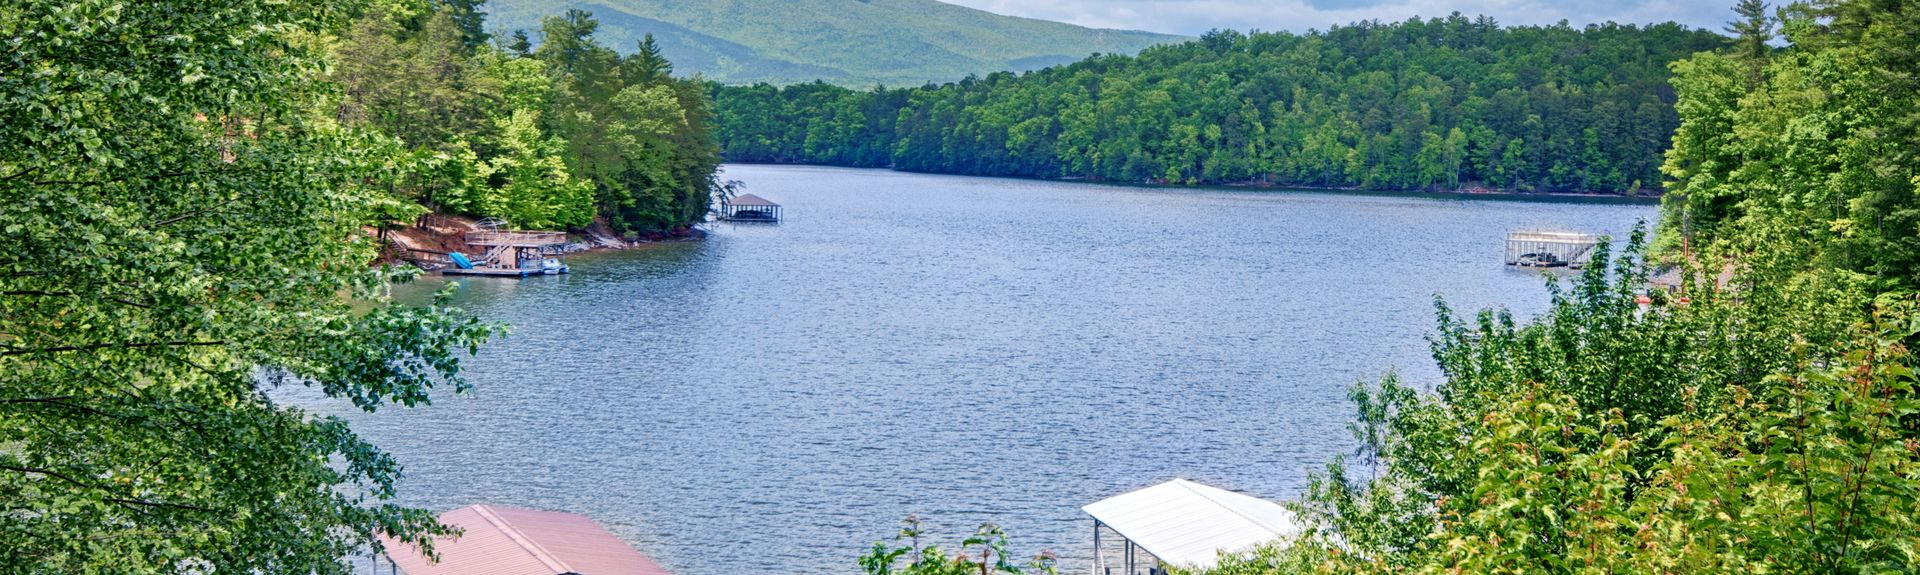 Vrbo® | Boulderline Adventure Programs, Lake Lure Vacation Rentals